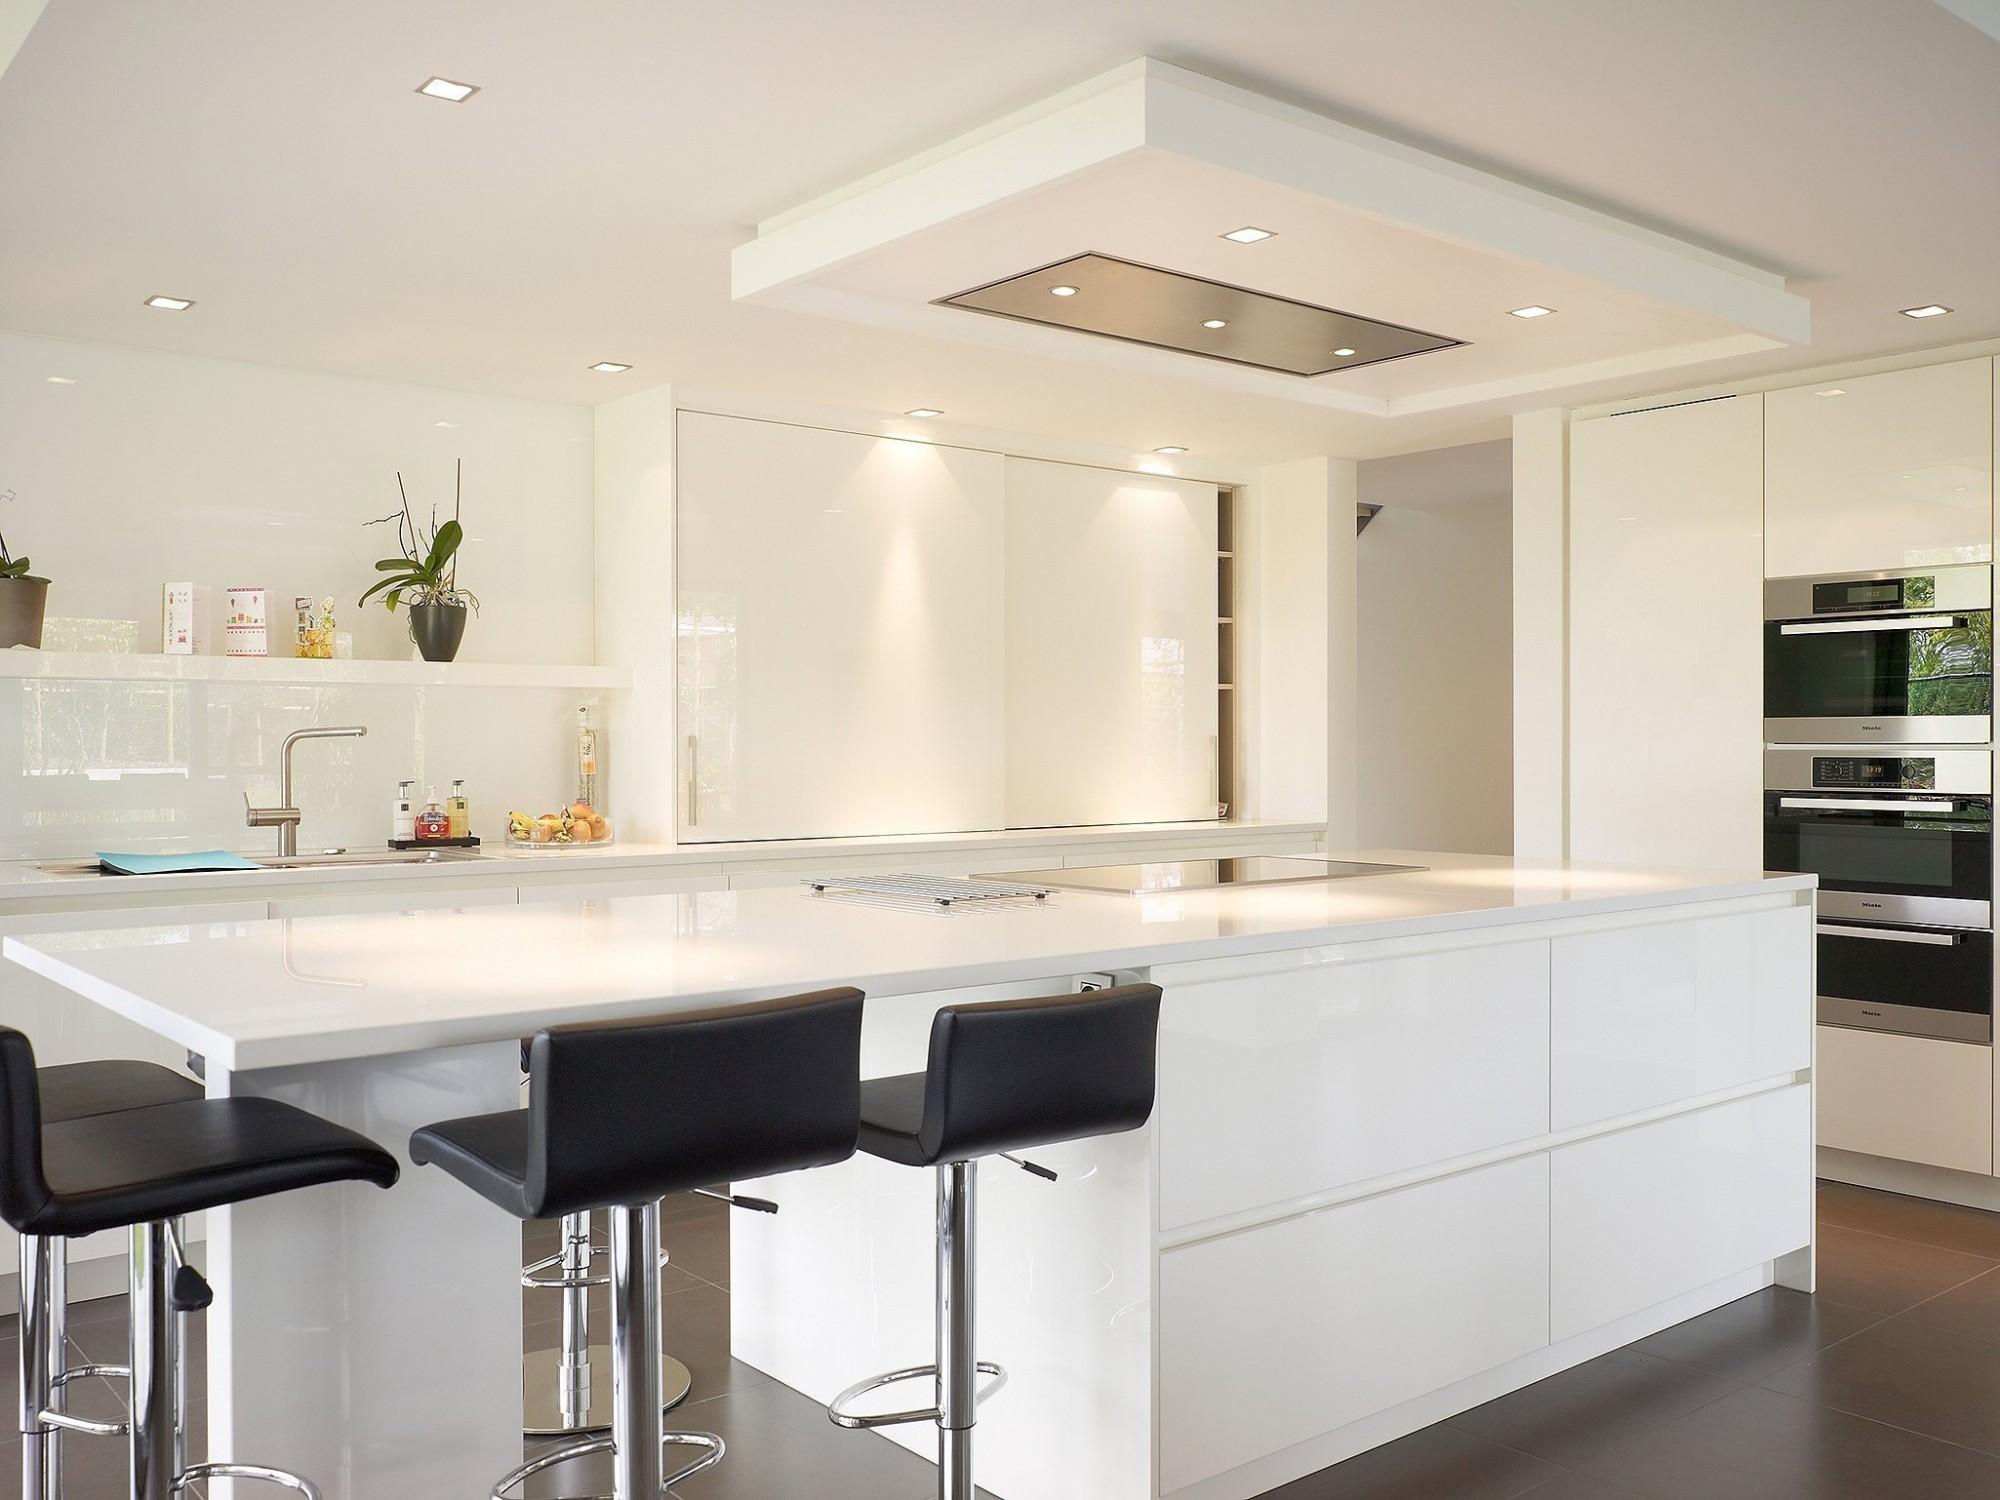 Interieur keuken zwart wit communicatie